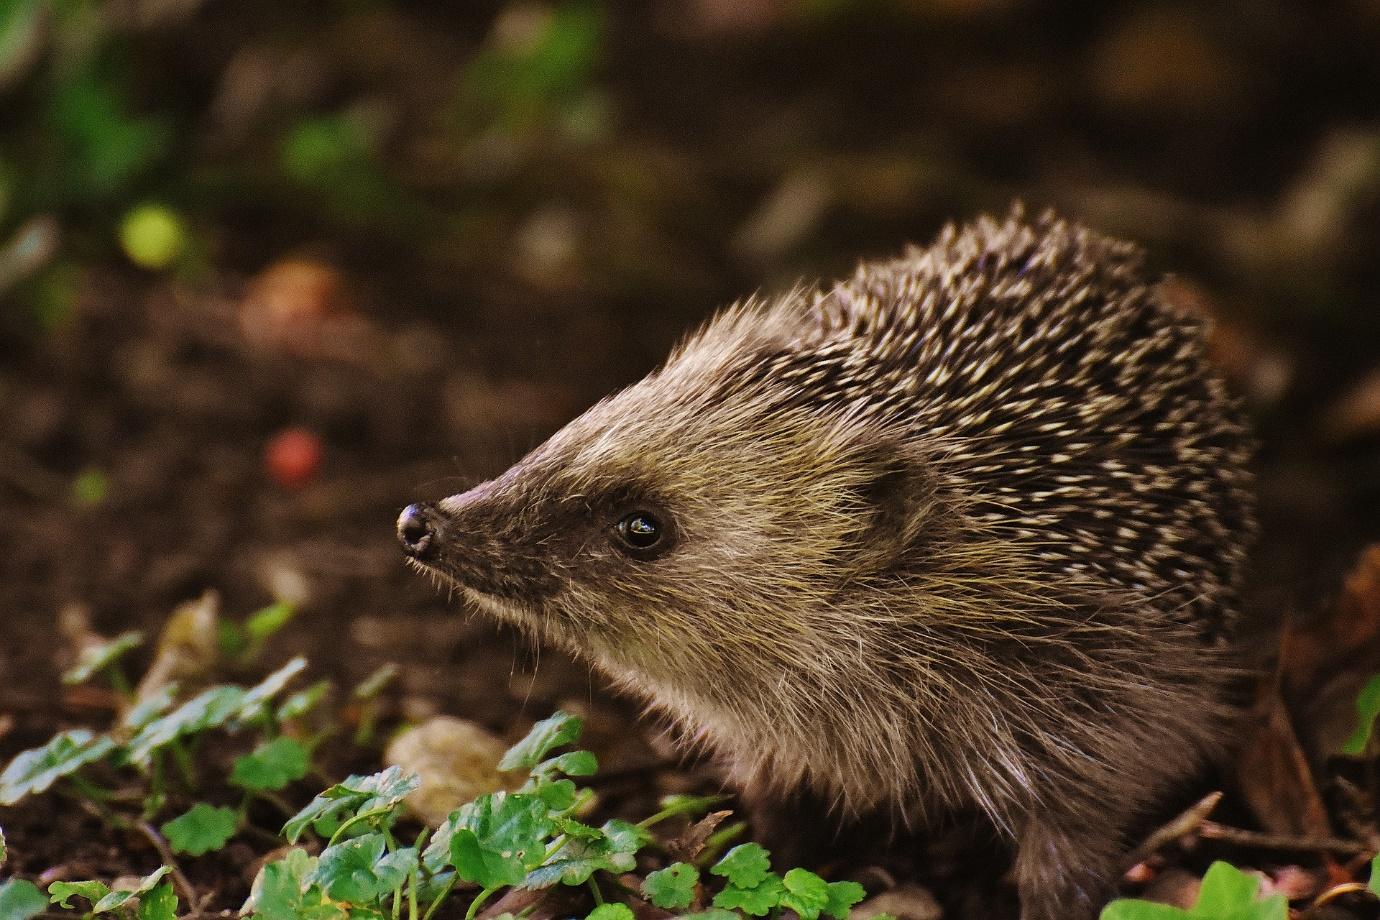 Autumn gardening jobs - Hedgehogs